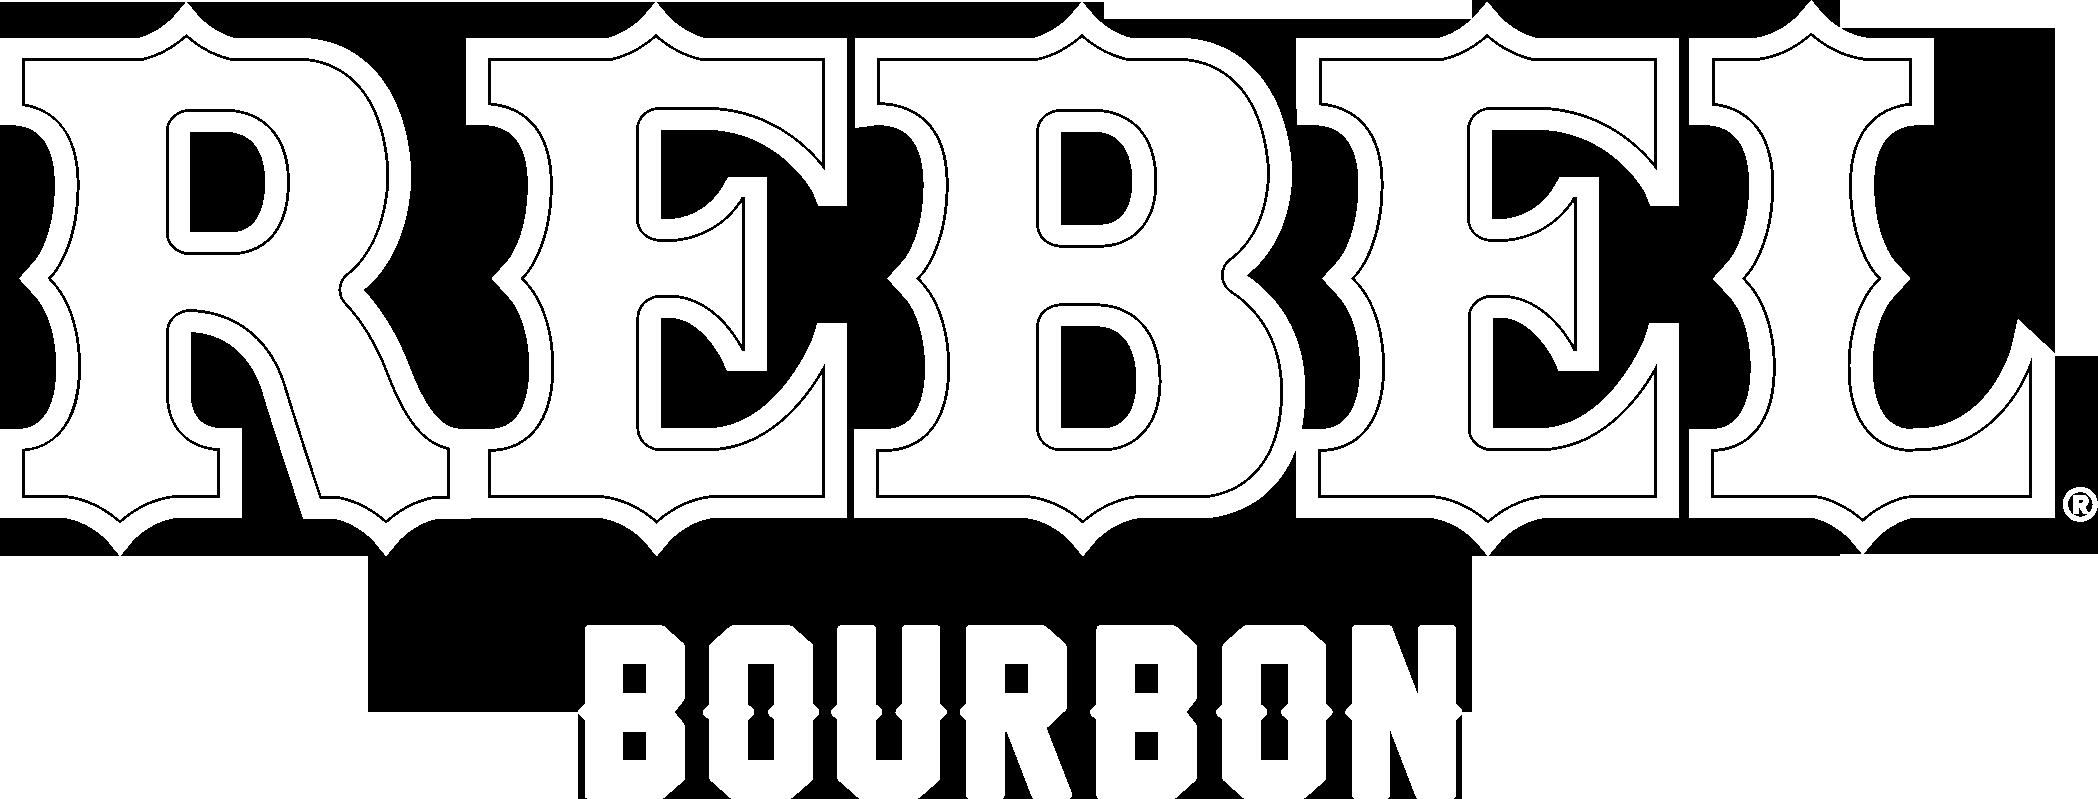 Rebel Bourbon